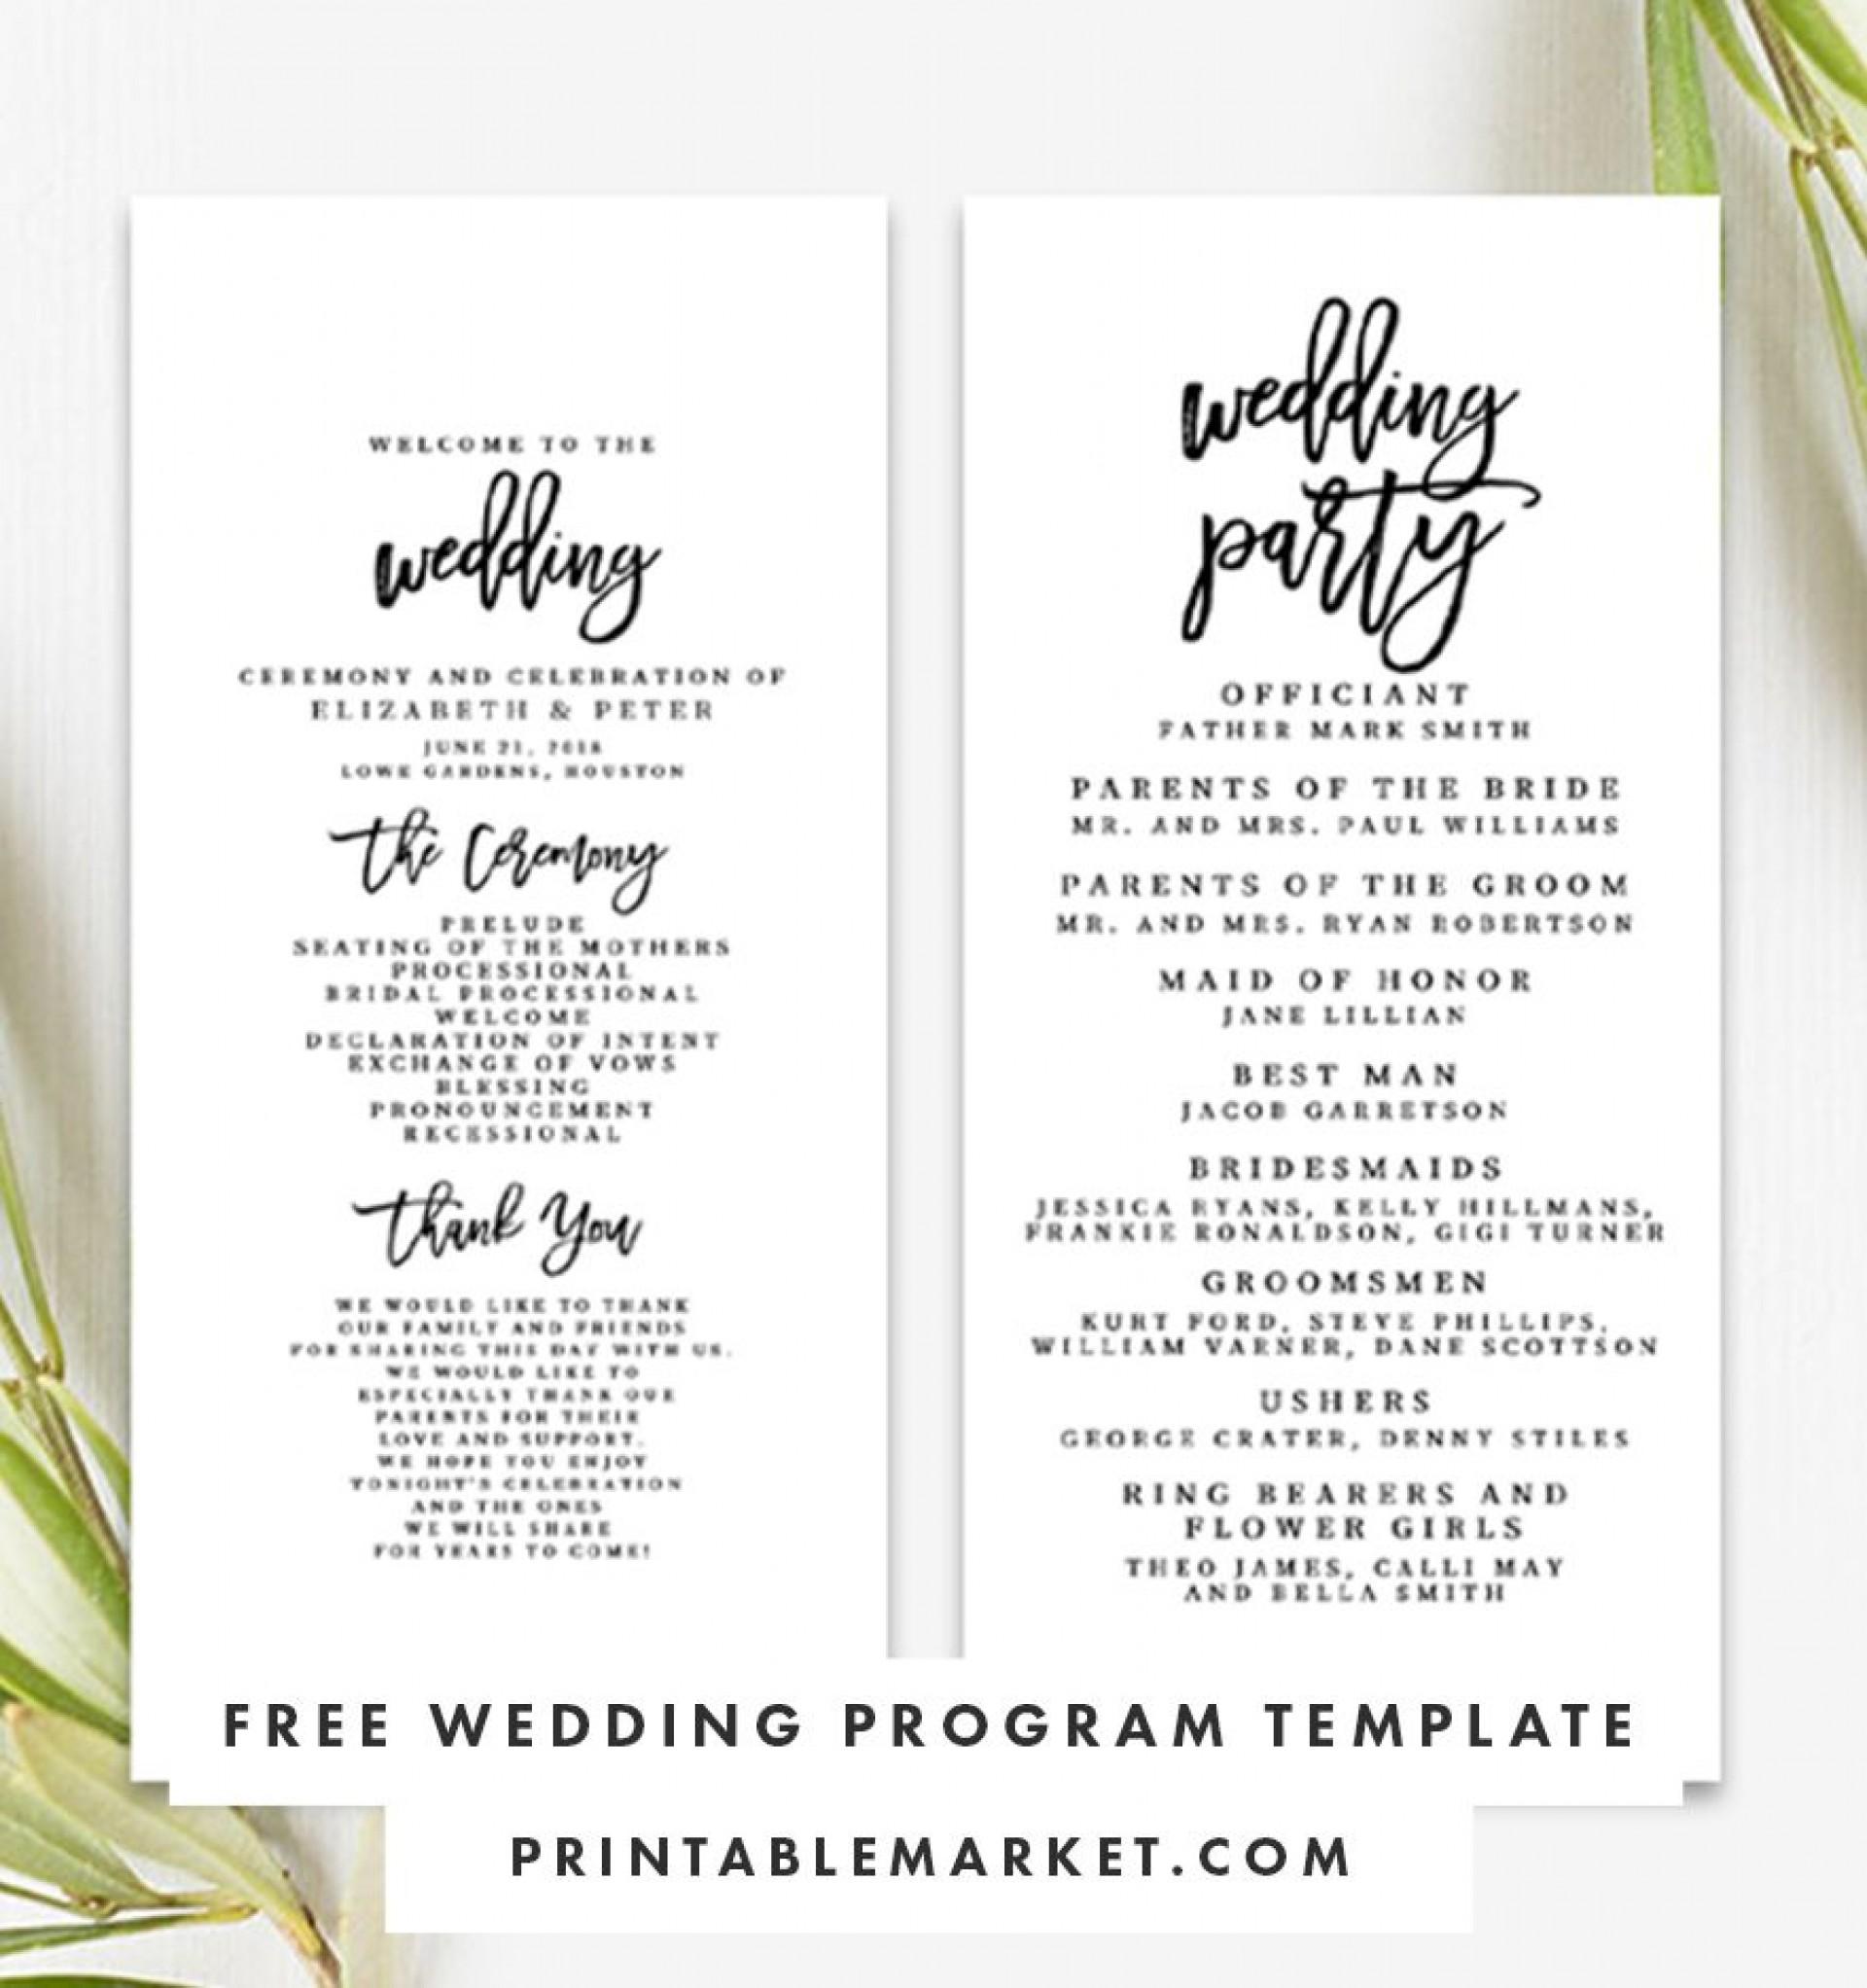 009 Phenomenal Free Wedding Ceremony Program Template Design  Catholic Download1920